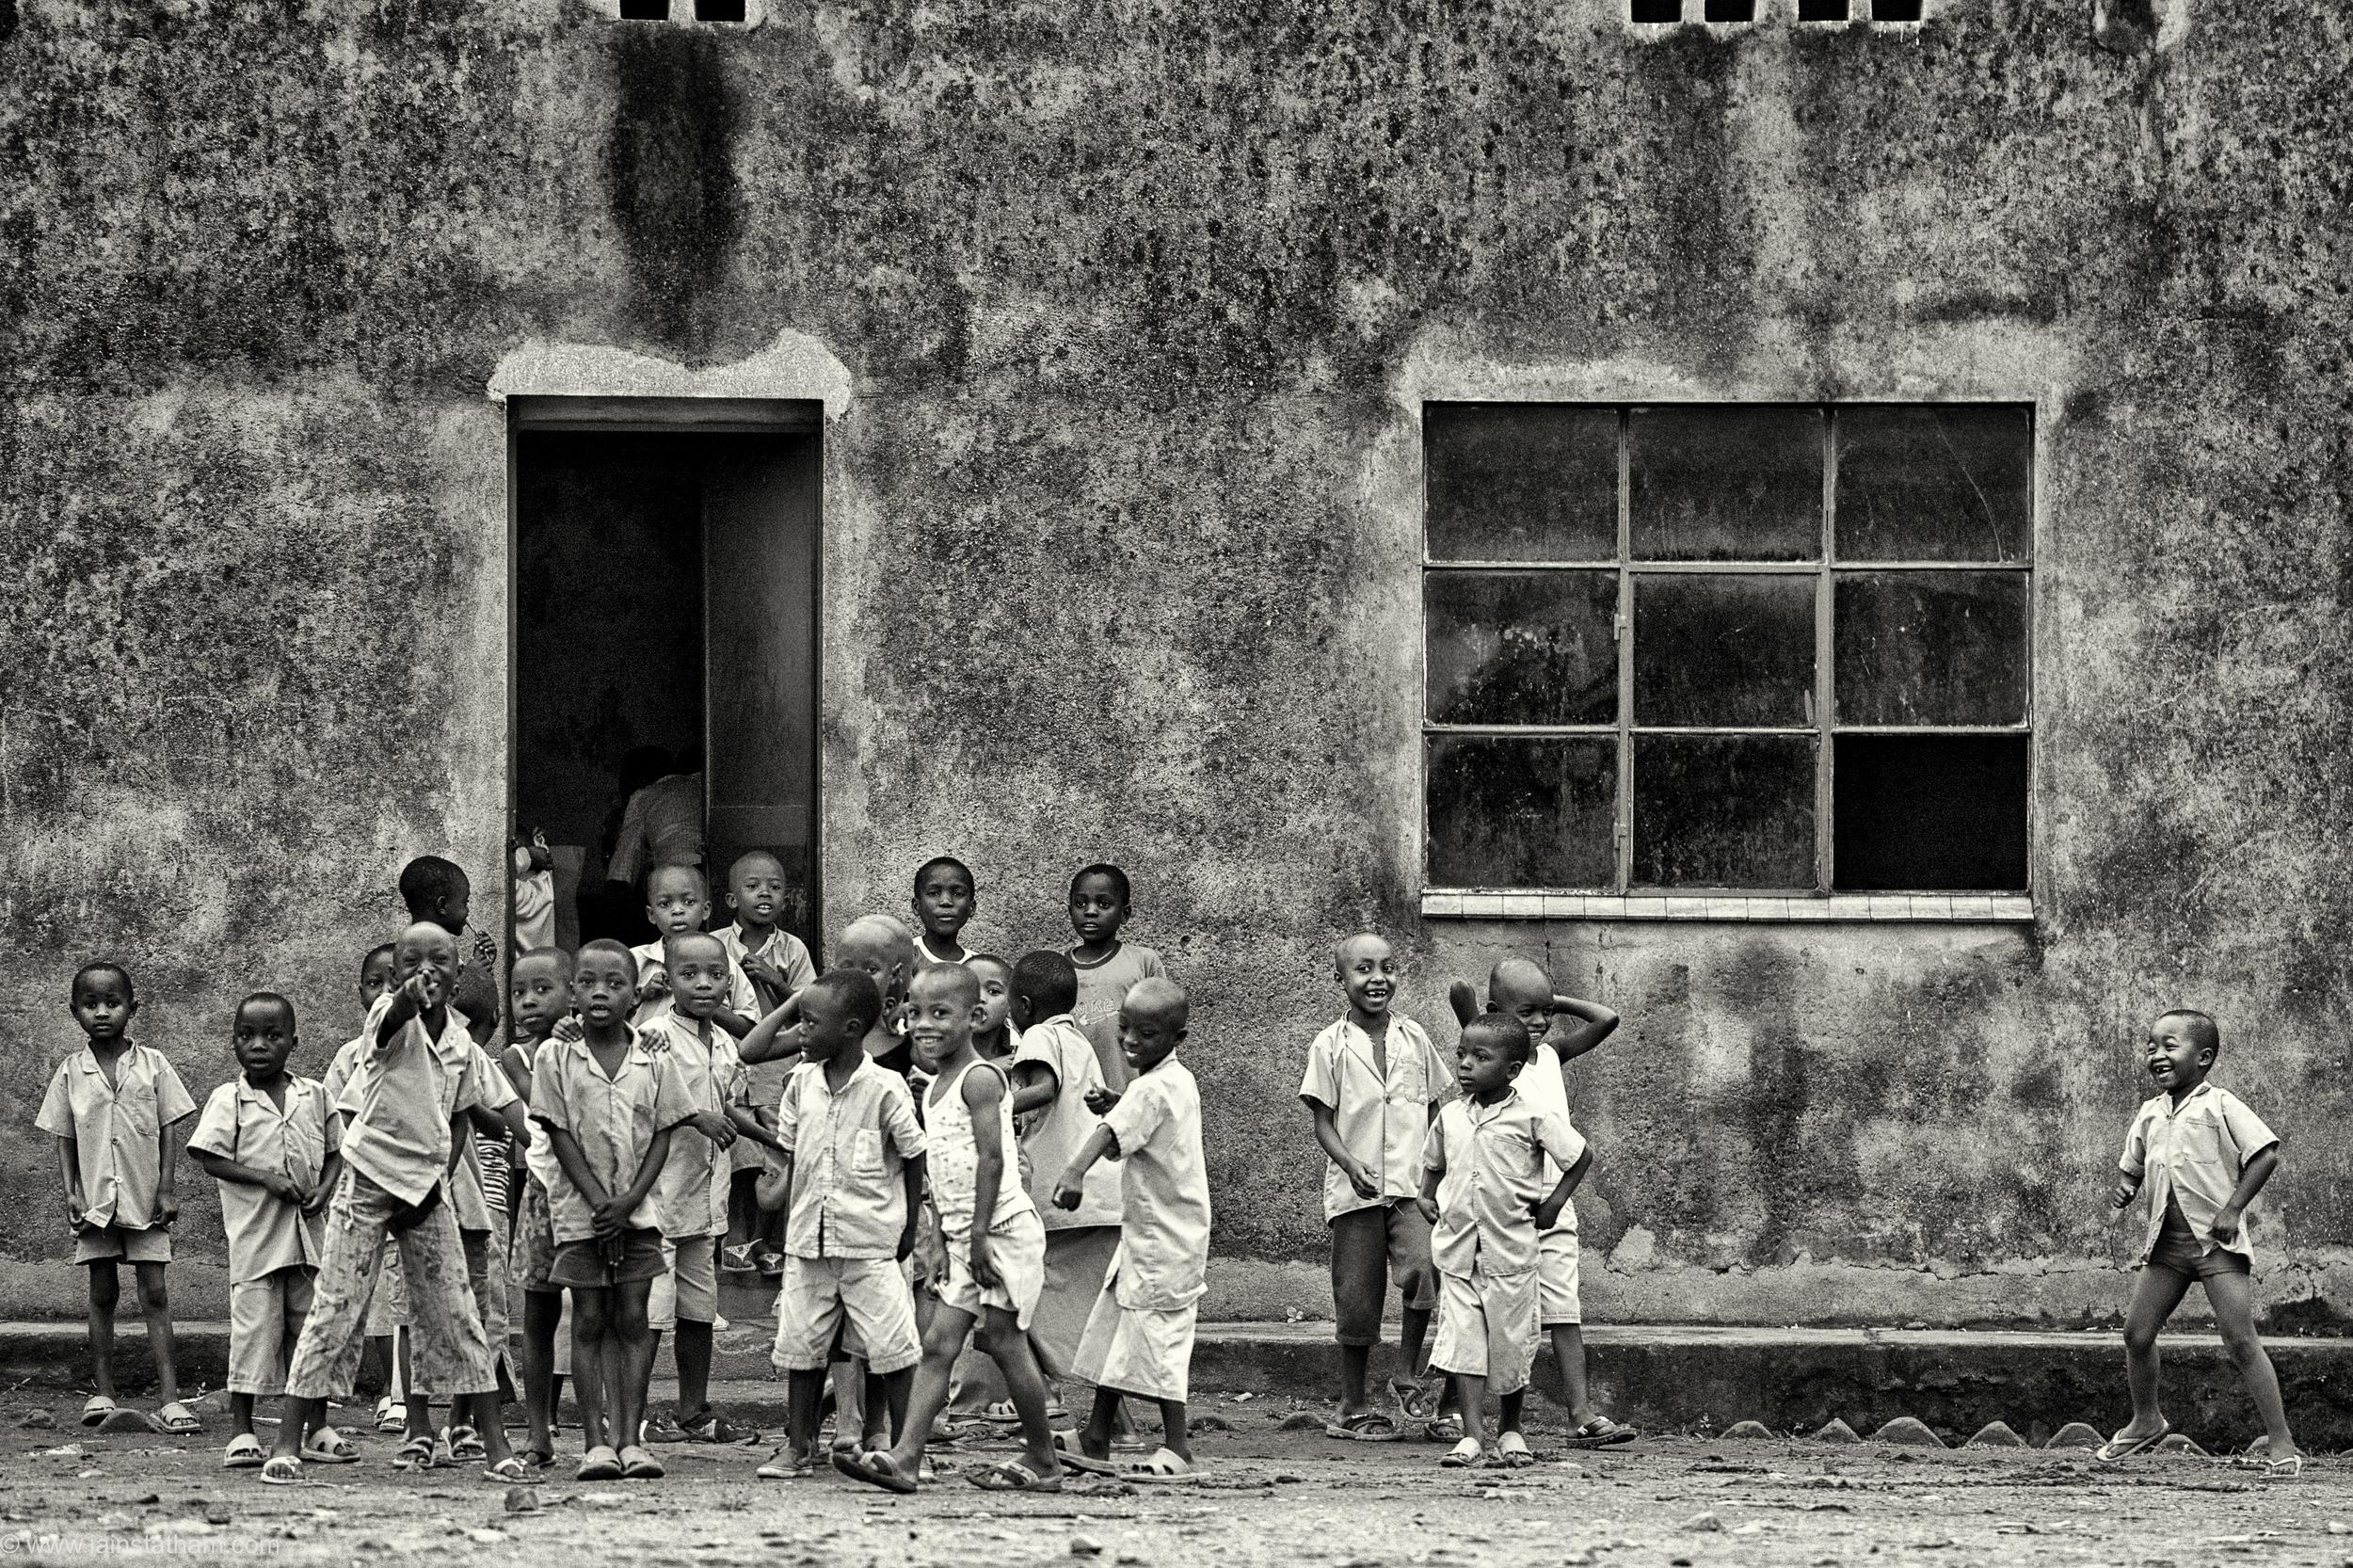 bur - makamba - school - bw-1.jpg